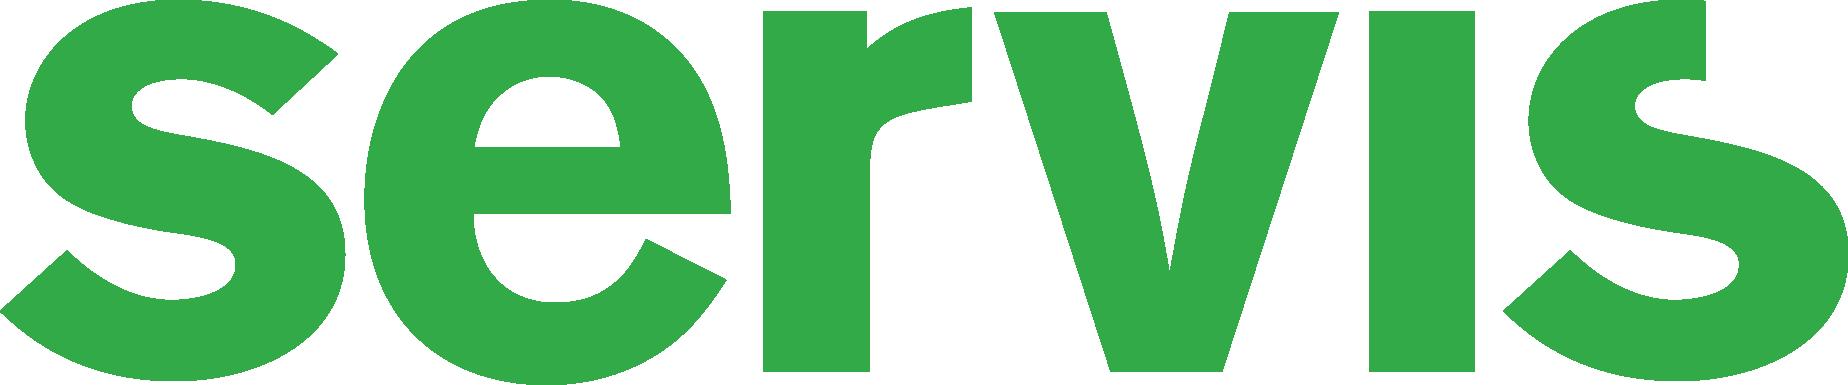 logo-servis verde